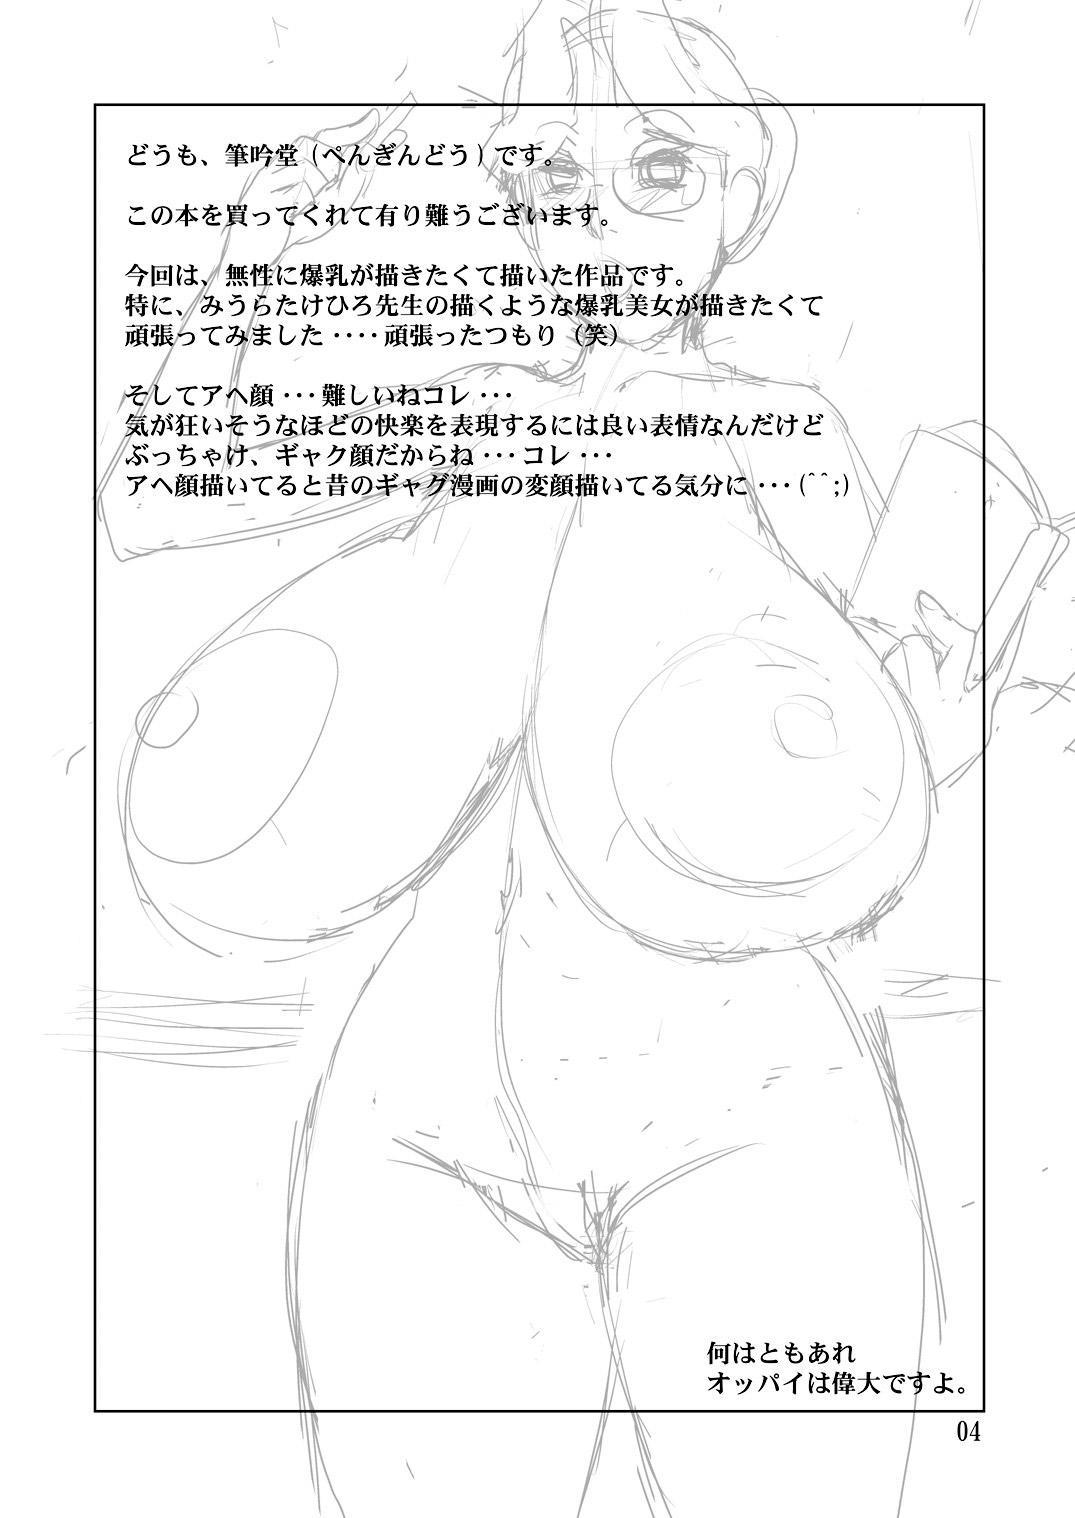 (COMIC1☆05) [Penguindou] Bakunyuu Onna Kyoushi to Deka Chin Seito   Enormous-Breasted Female Teacher and Huge-Dick Student [English] 2